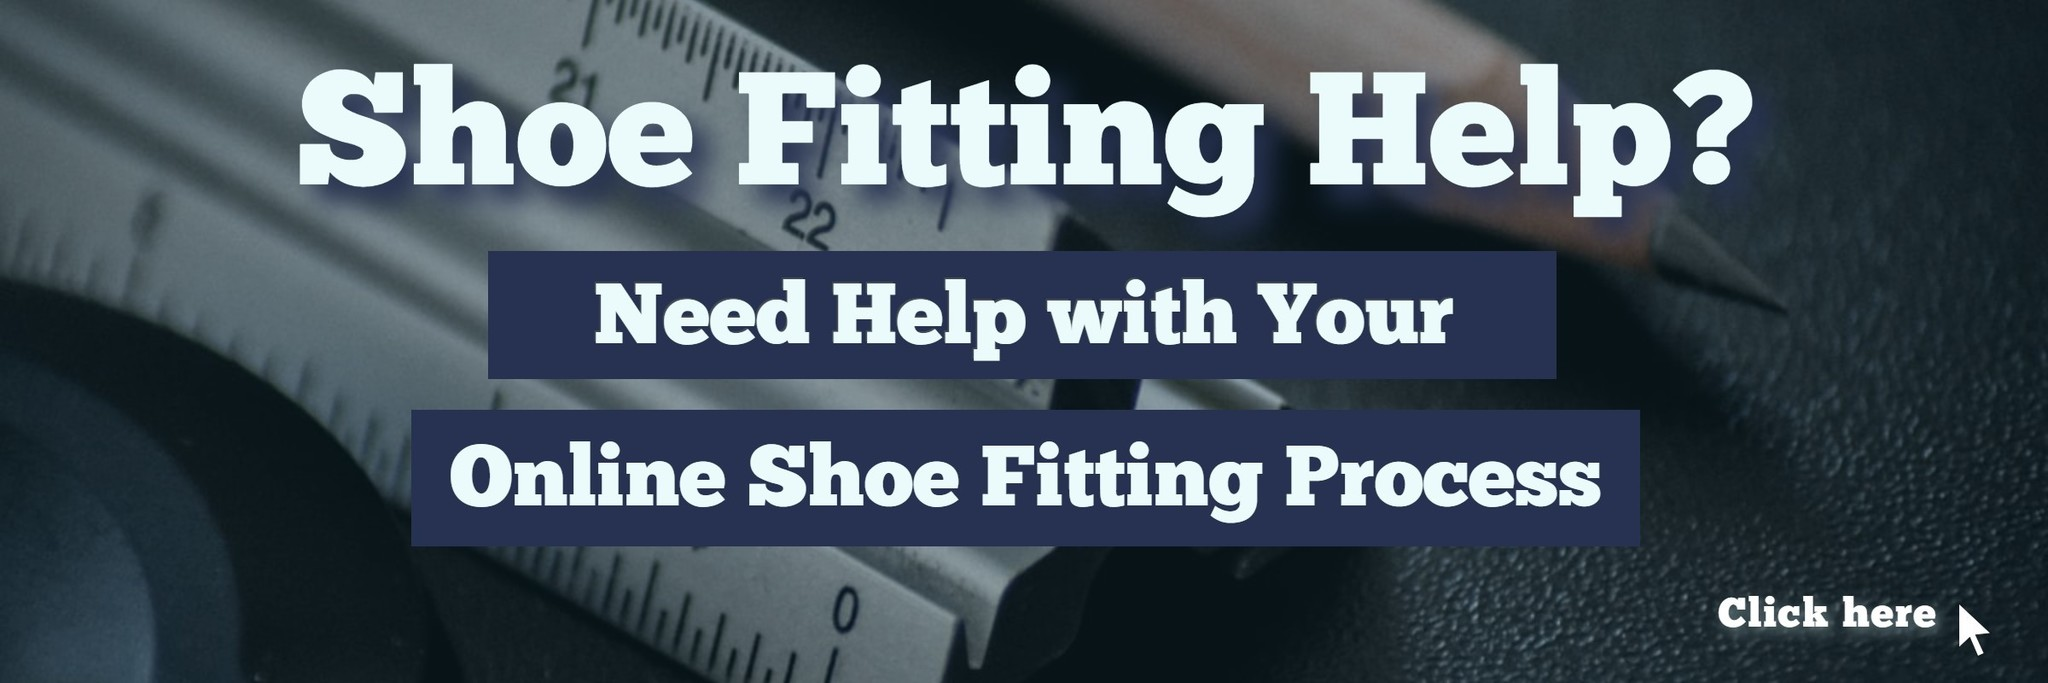 Shoe Fitting Help